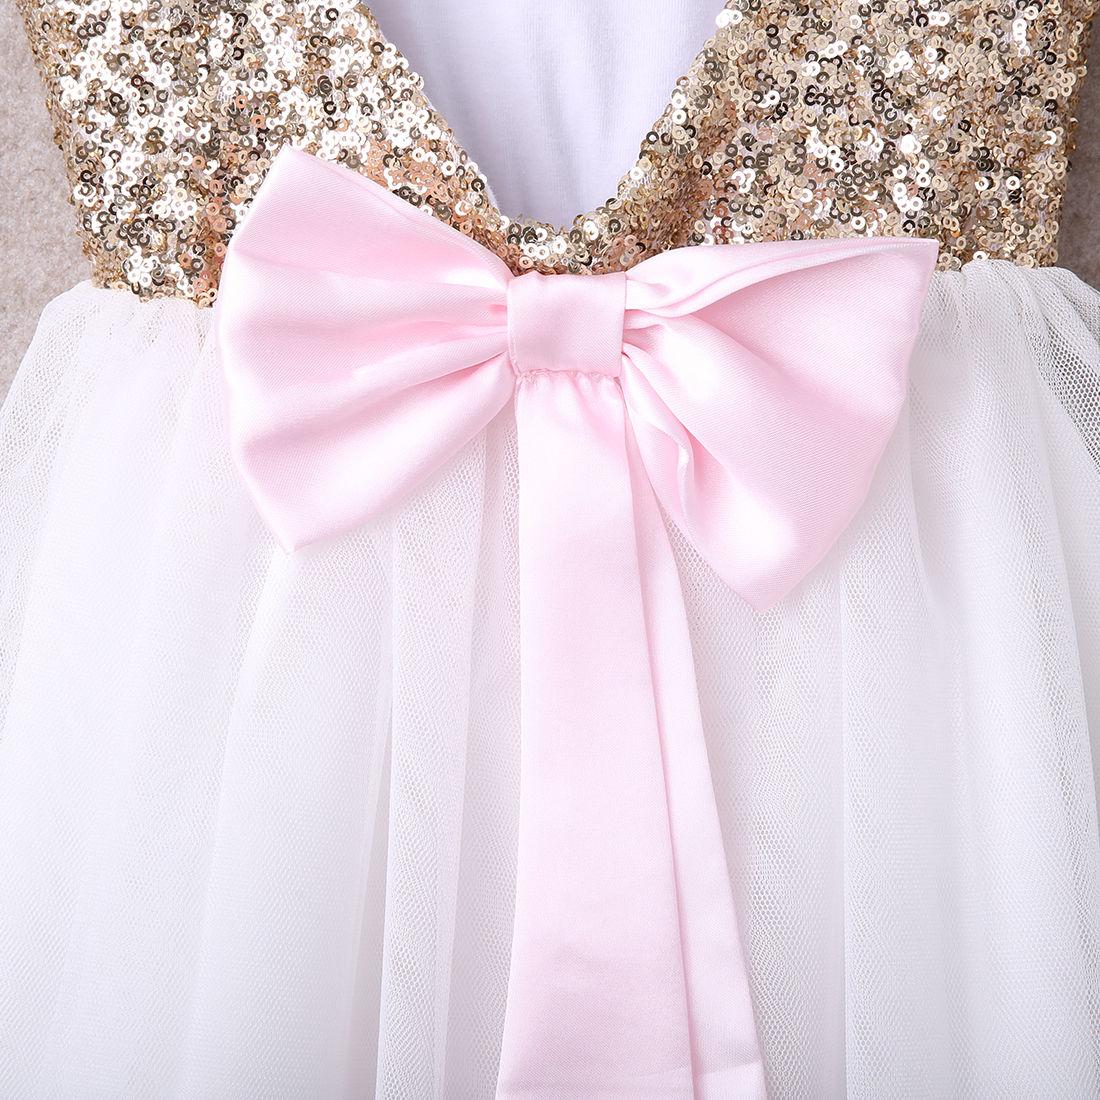 3a8c76354 Kids Sequins Baby Girls Infantil Child Dress Bow Backless Party ...